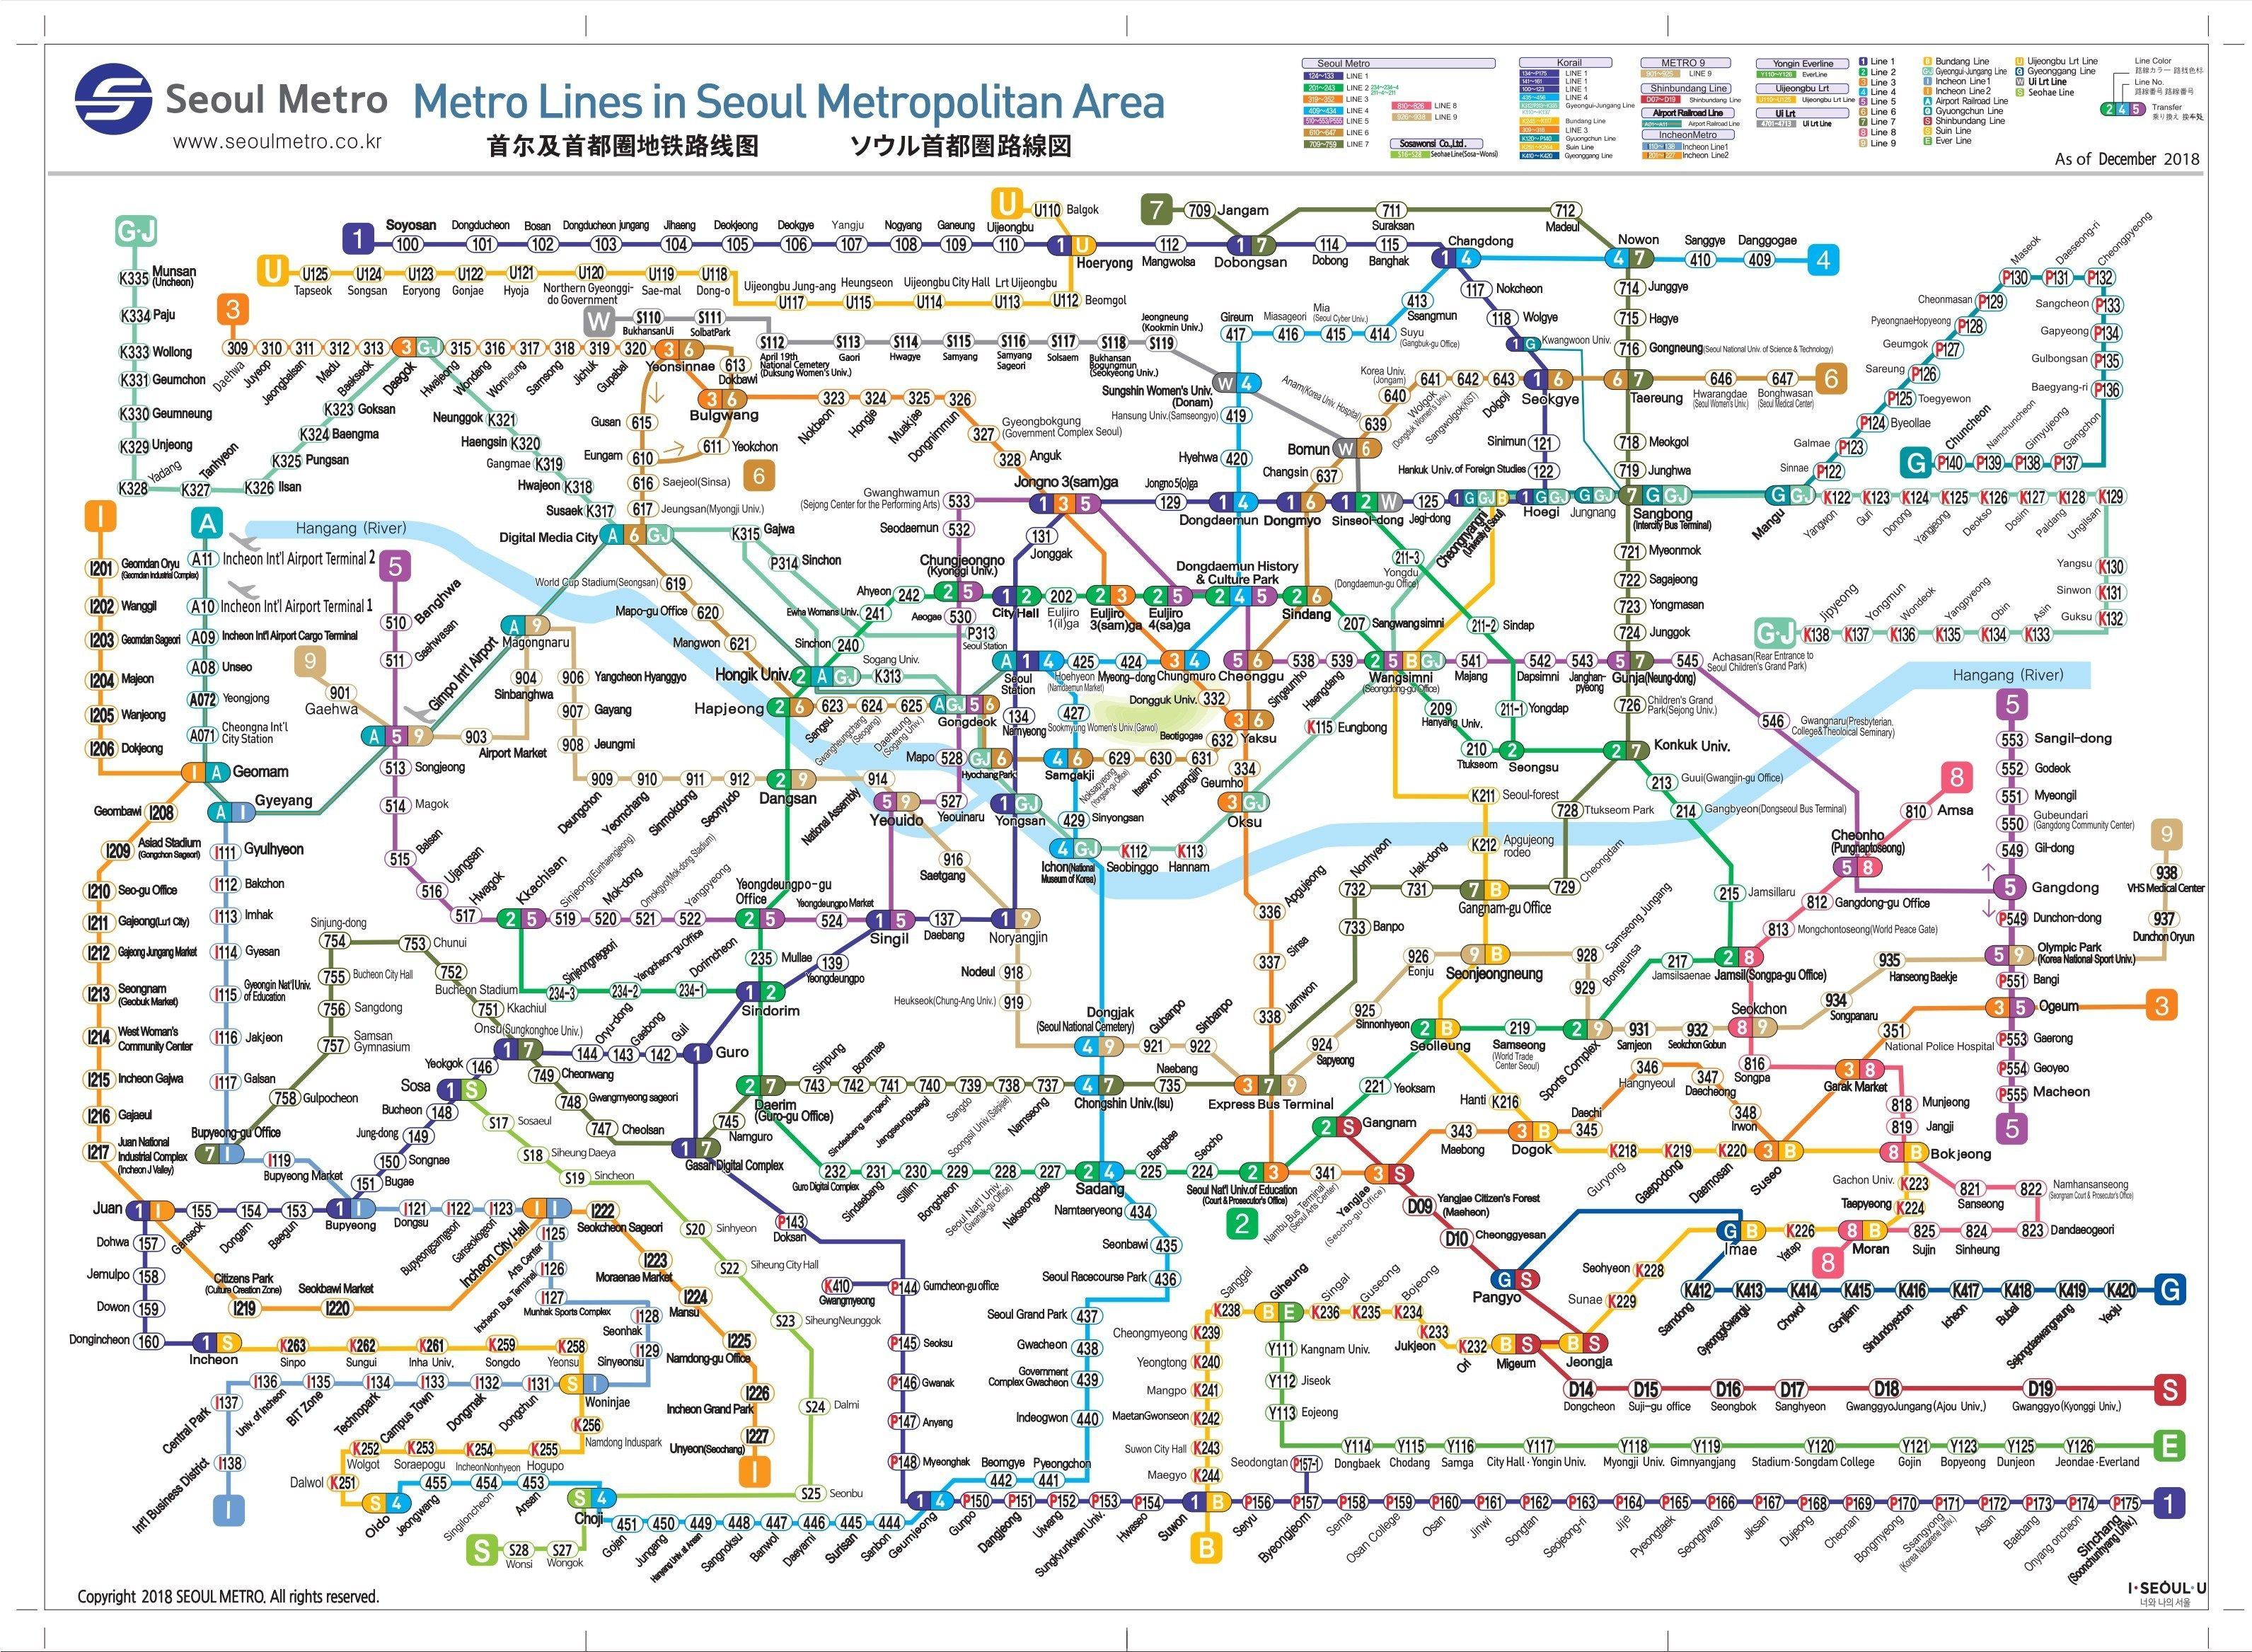 Seoul Subway Map 2014.Seoul Metro Map Metro Map Subway Map Seoul Itinerary